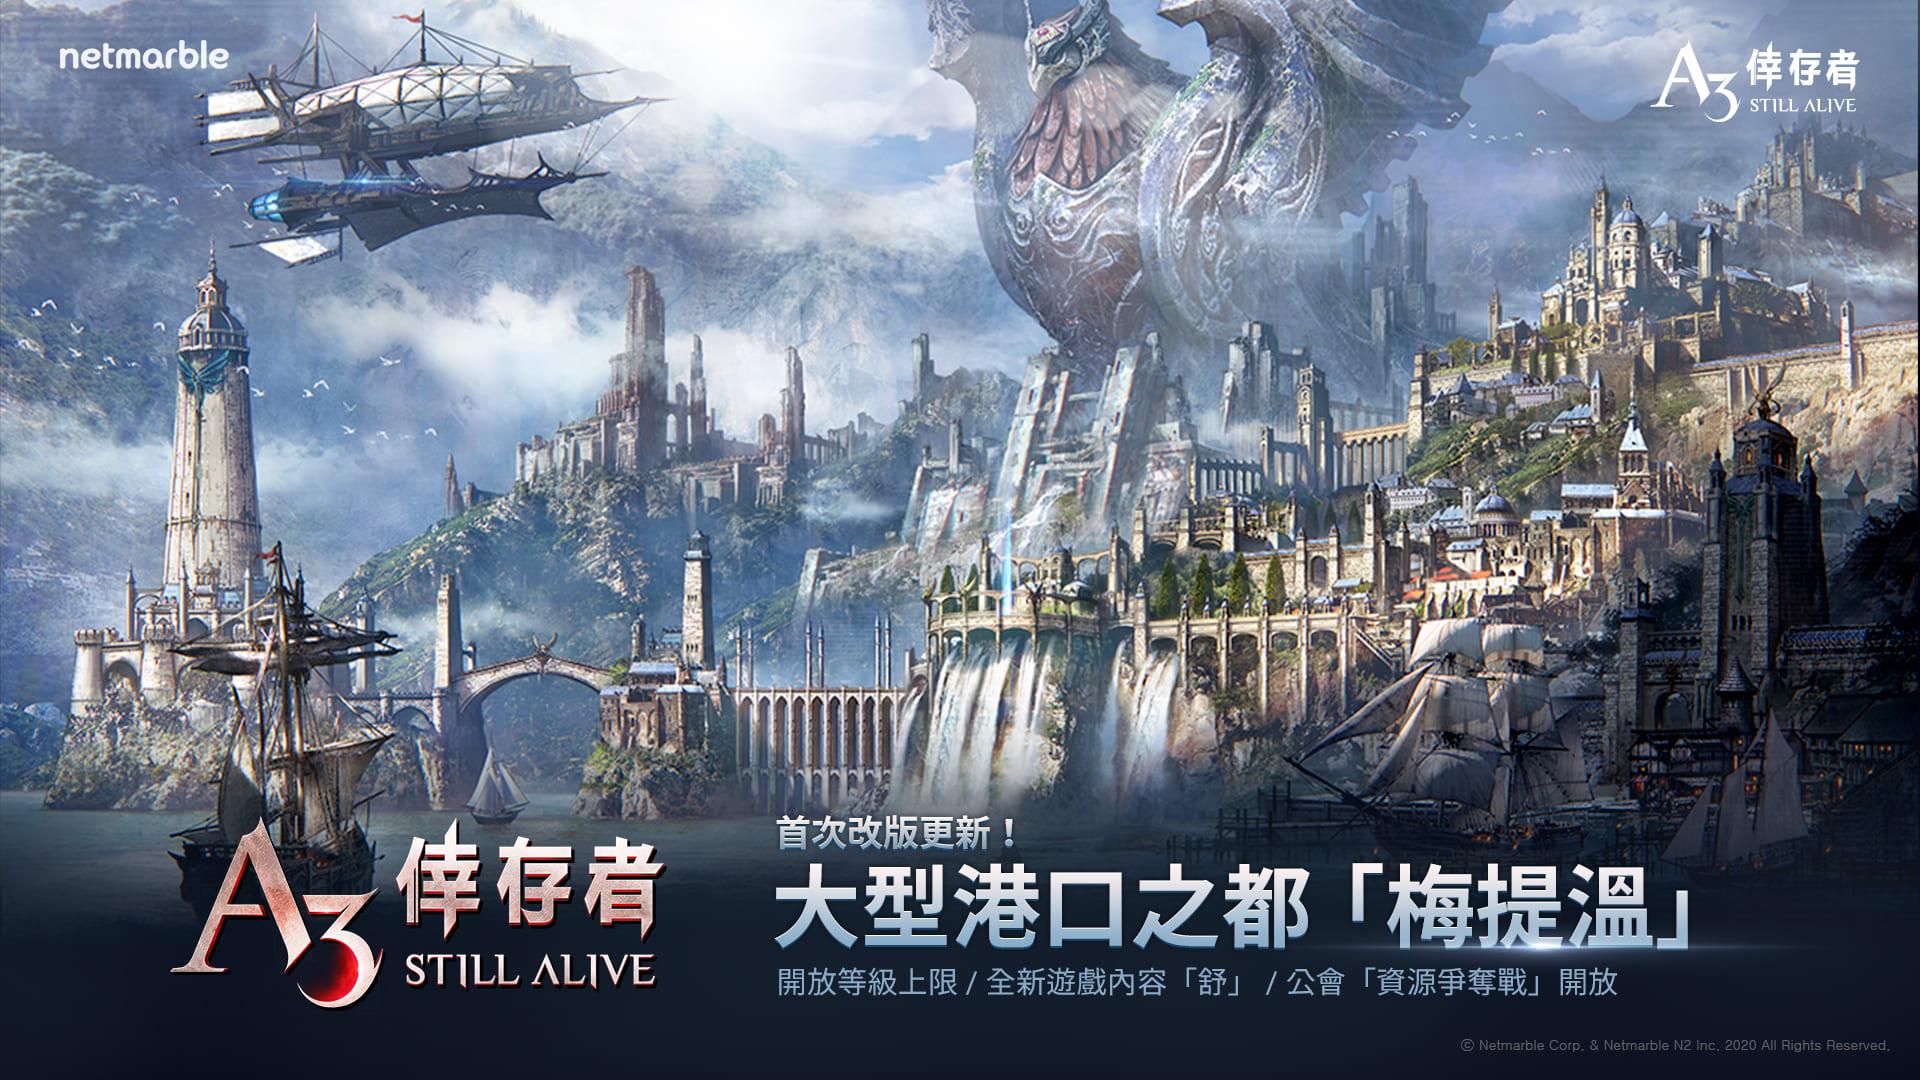 《A3: STILL ALIVE 倖存者》 極限生存MMORPG首度更新 全新地區「梅提溫」登場